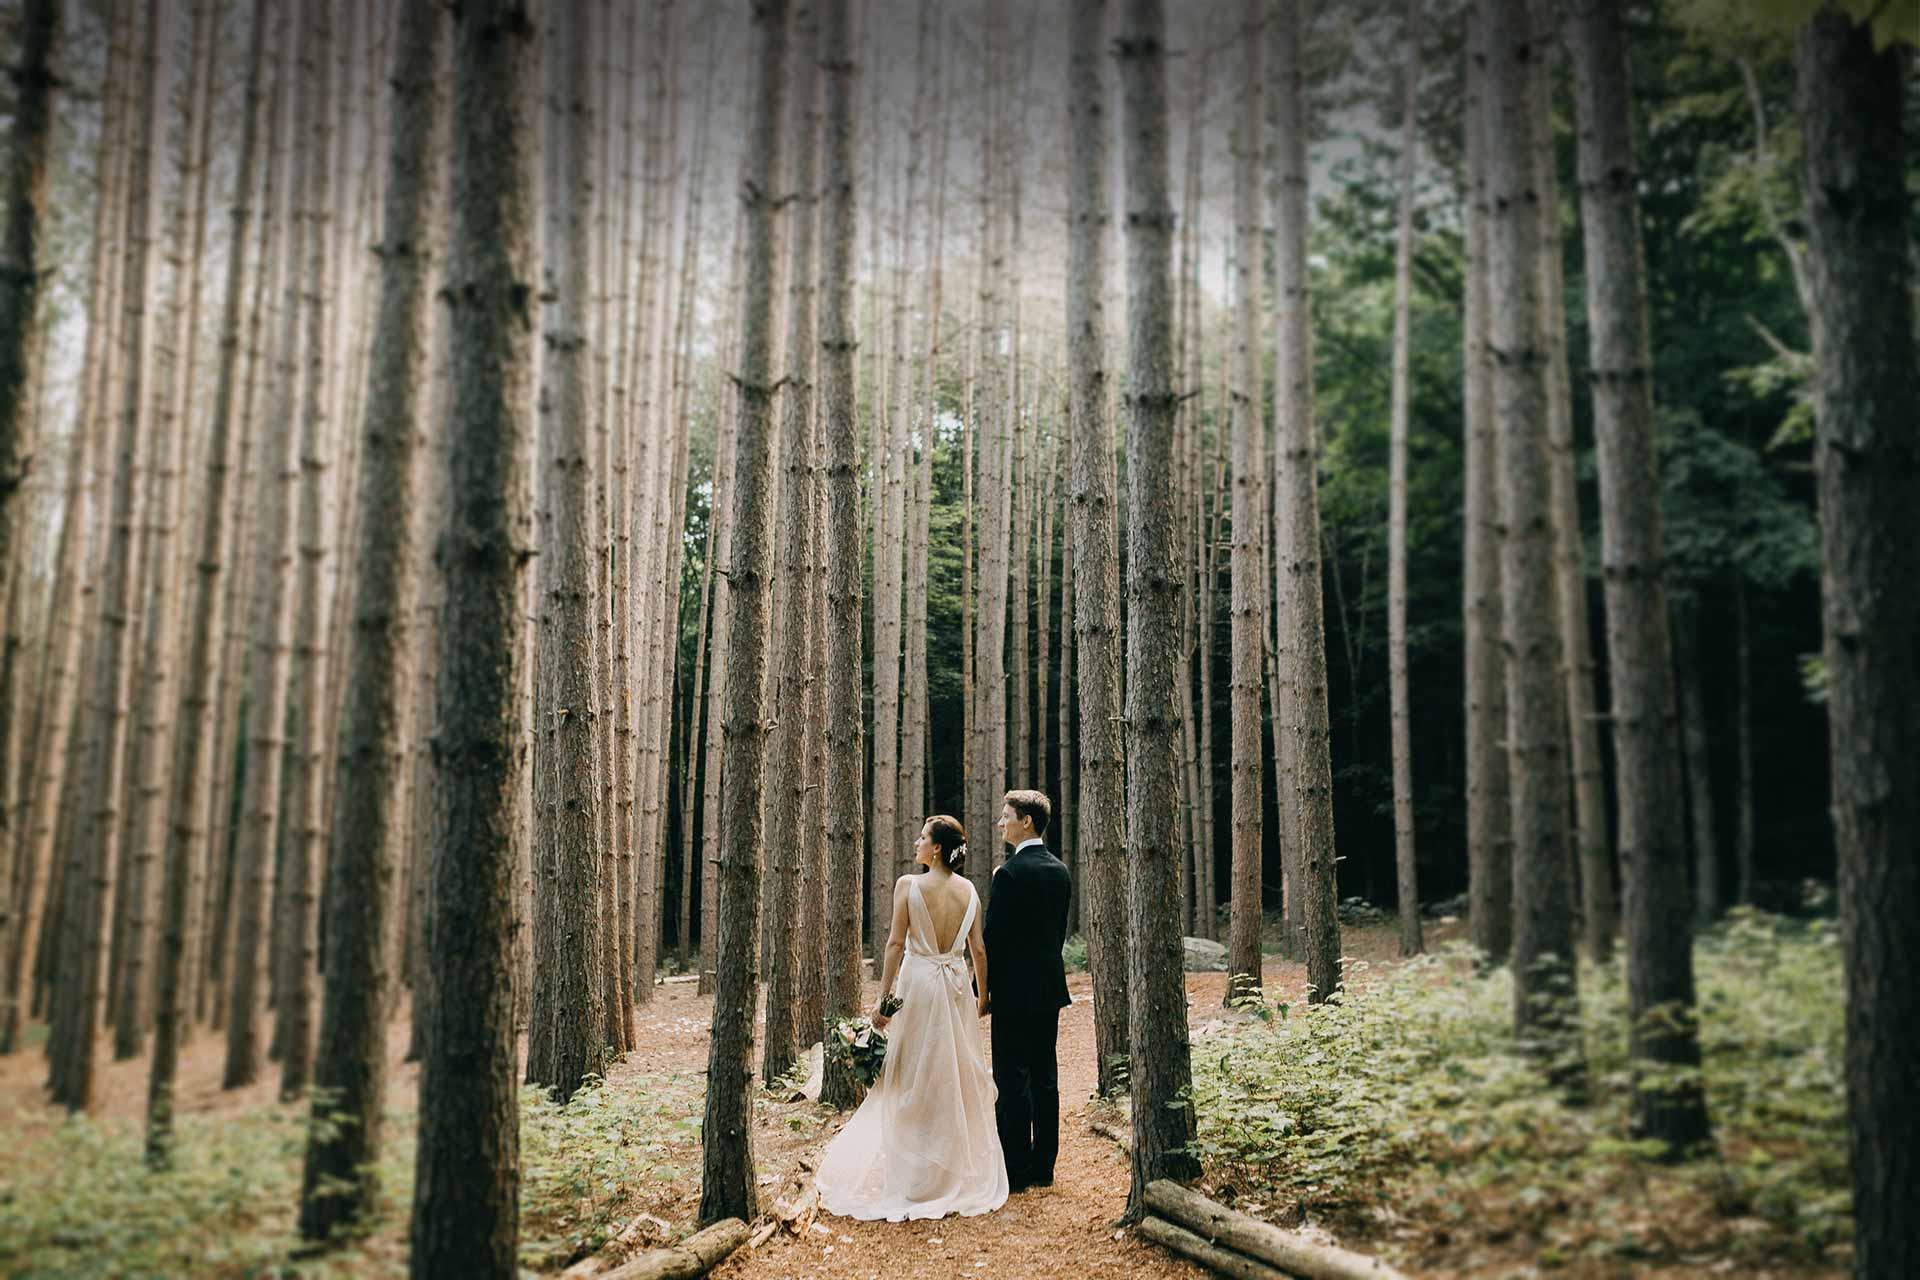 Unique Catskills wedding venue at a stylish forest mountain estate